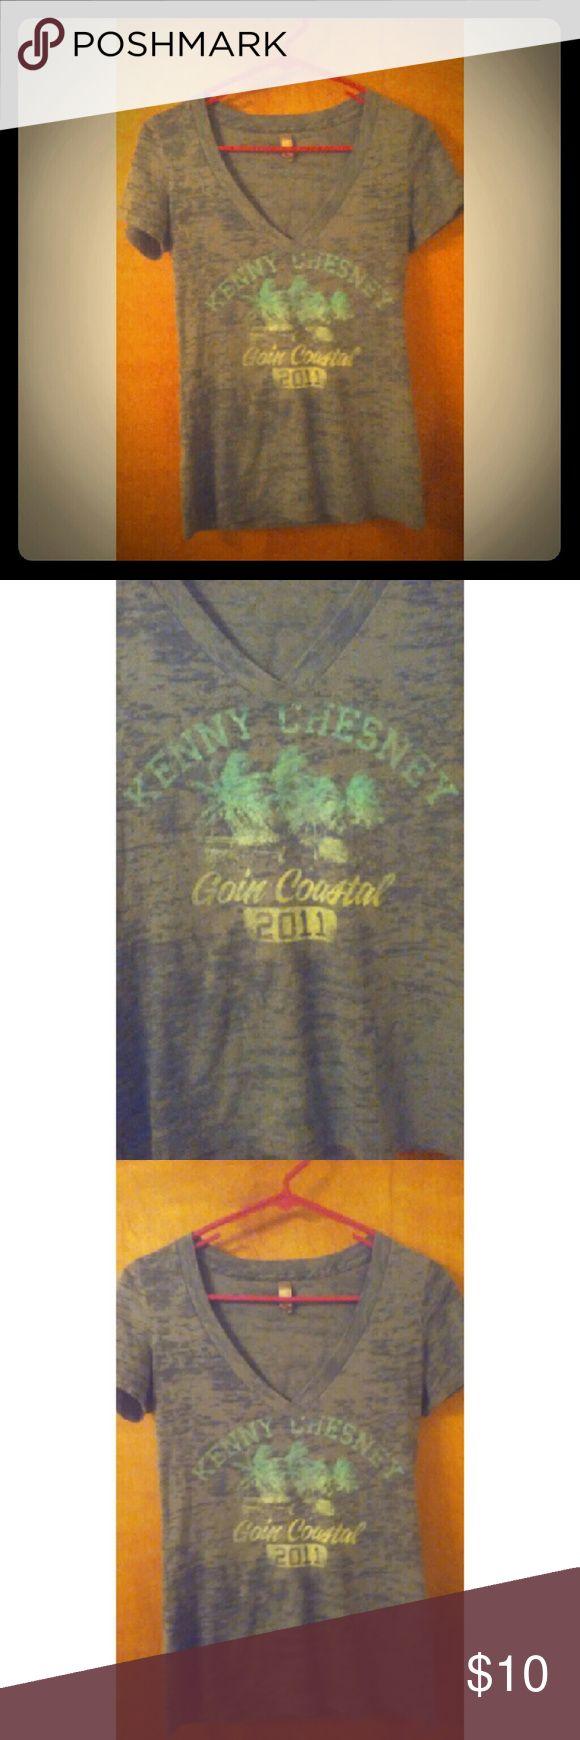 Kenny Chesney T-shirt Kenny Chesney goin coastal t shirt. Tops Tees - Short Sleeve